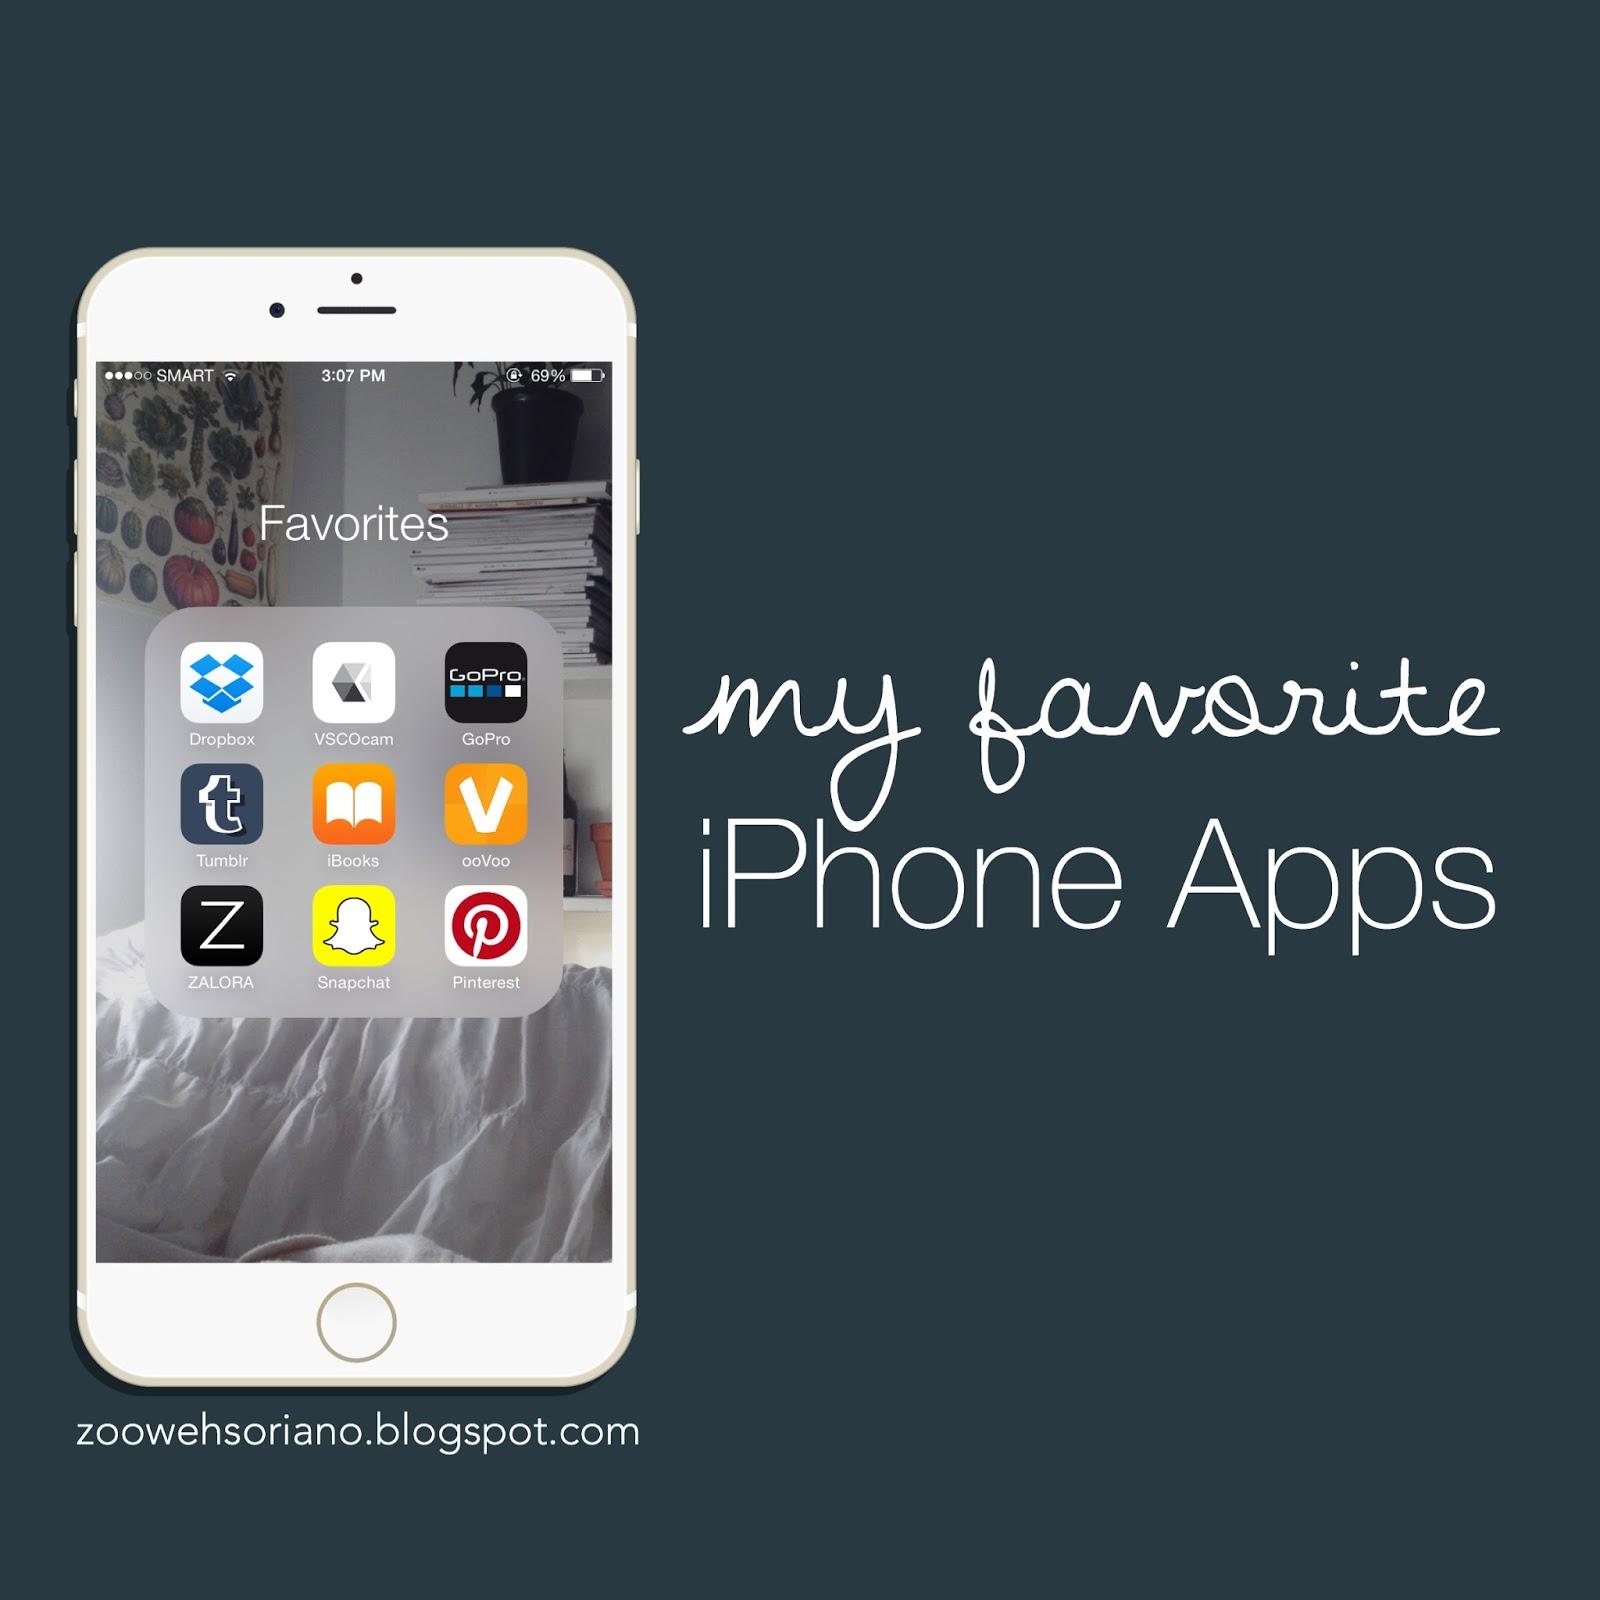 Favorite iPhone Apps - AyeItsZoe